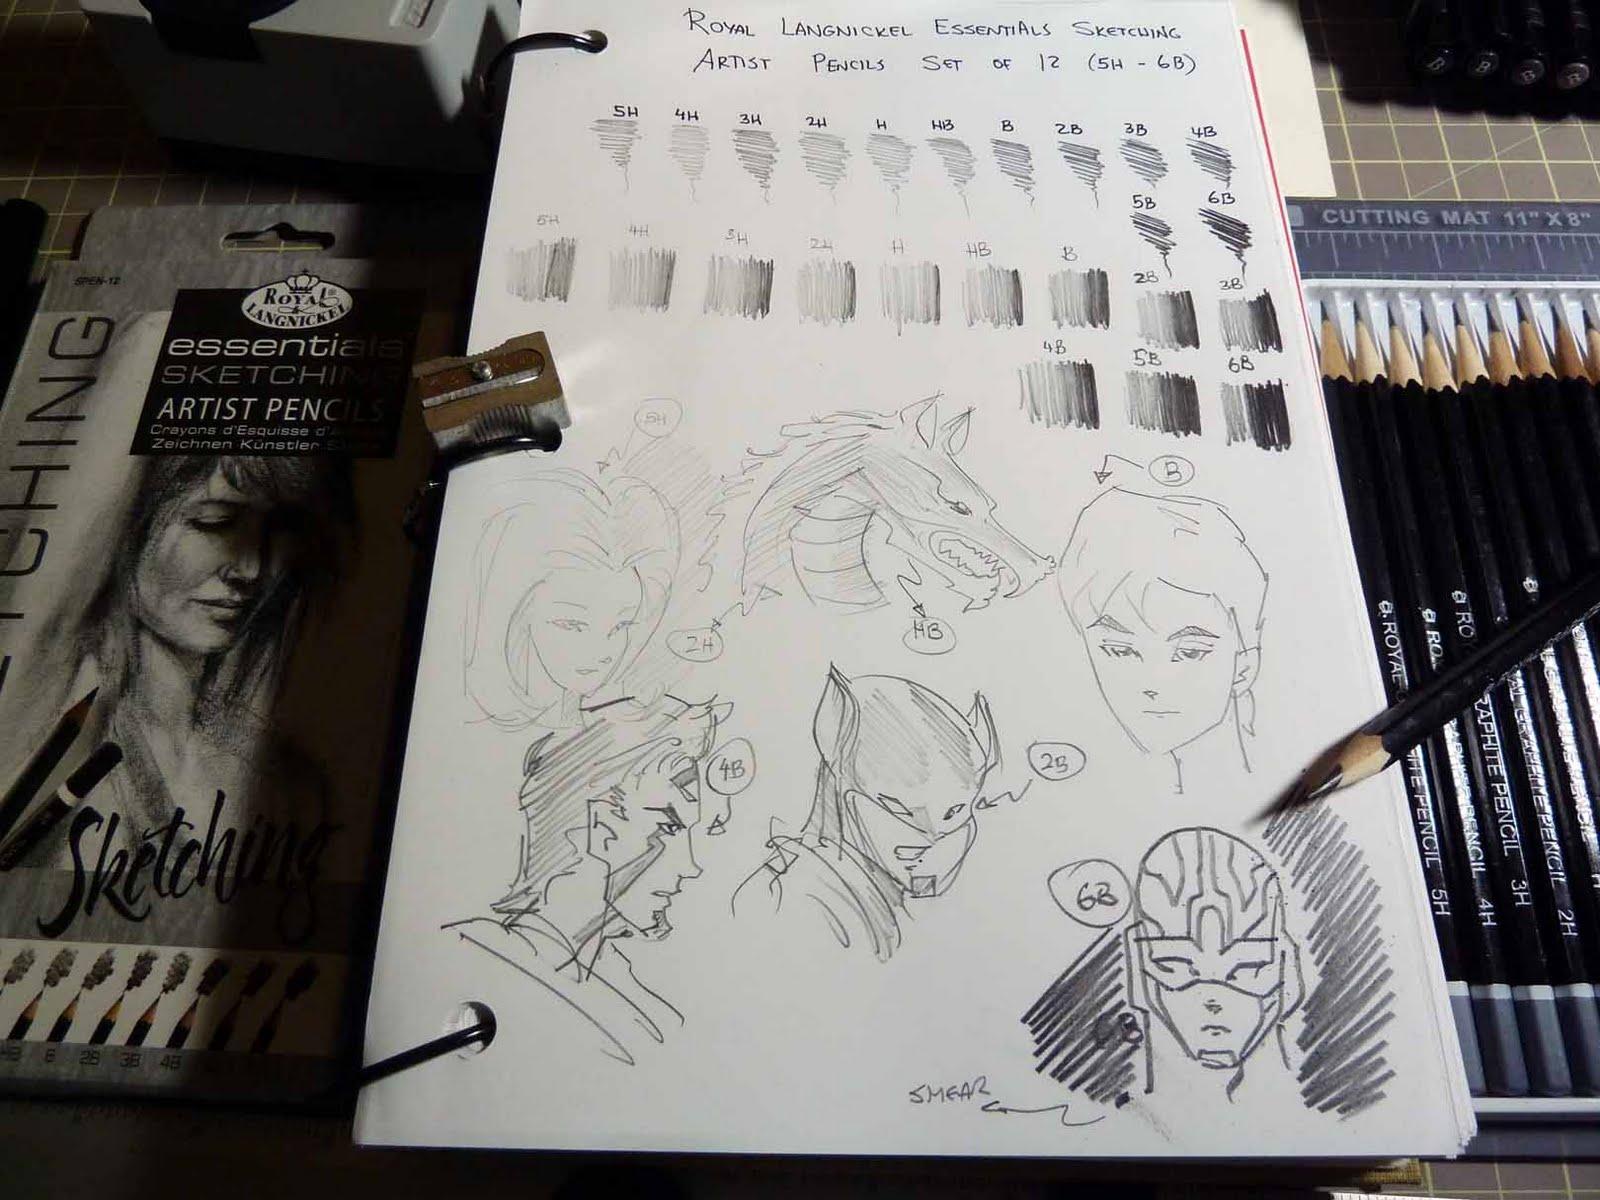 Royal langnickel sketching pencils set review art supplies reviews